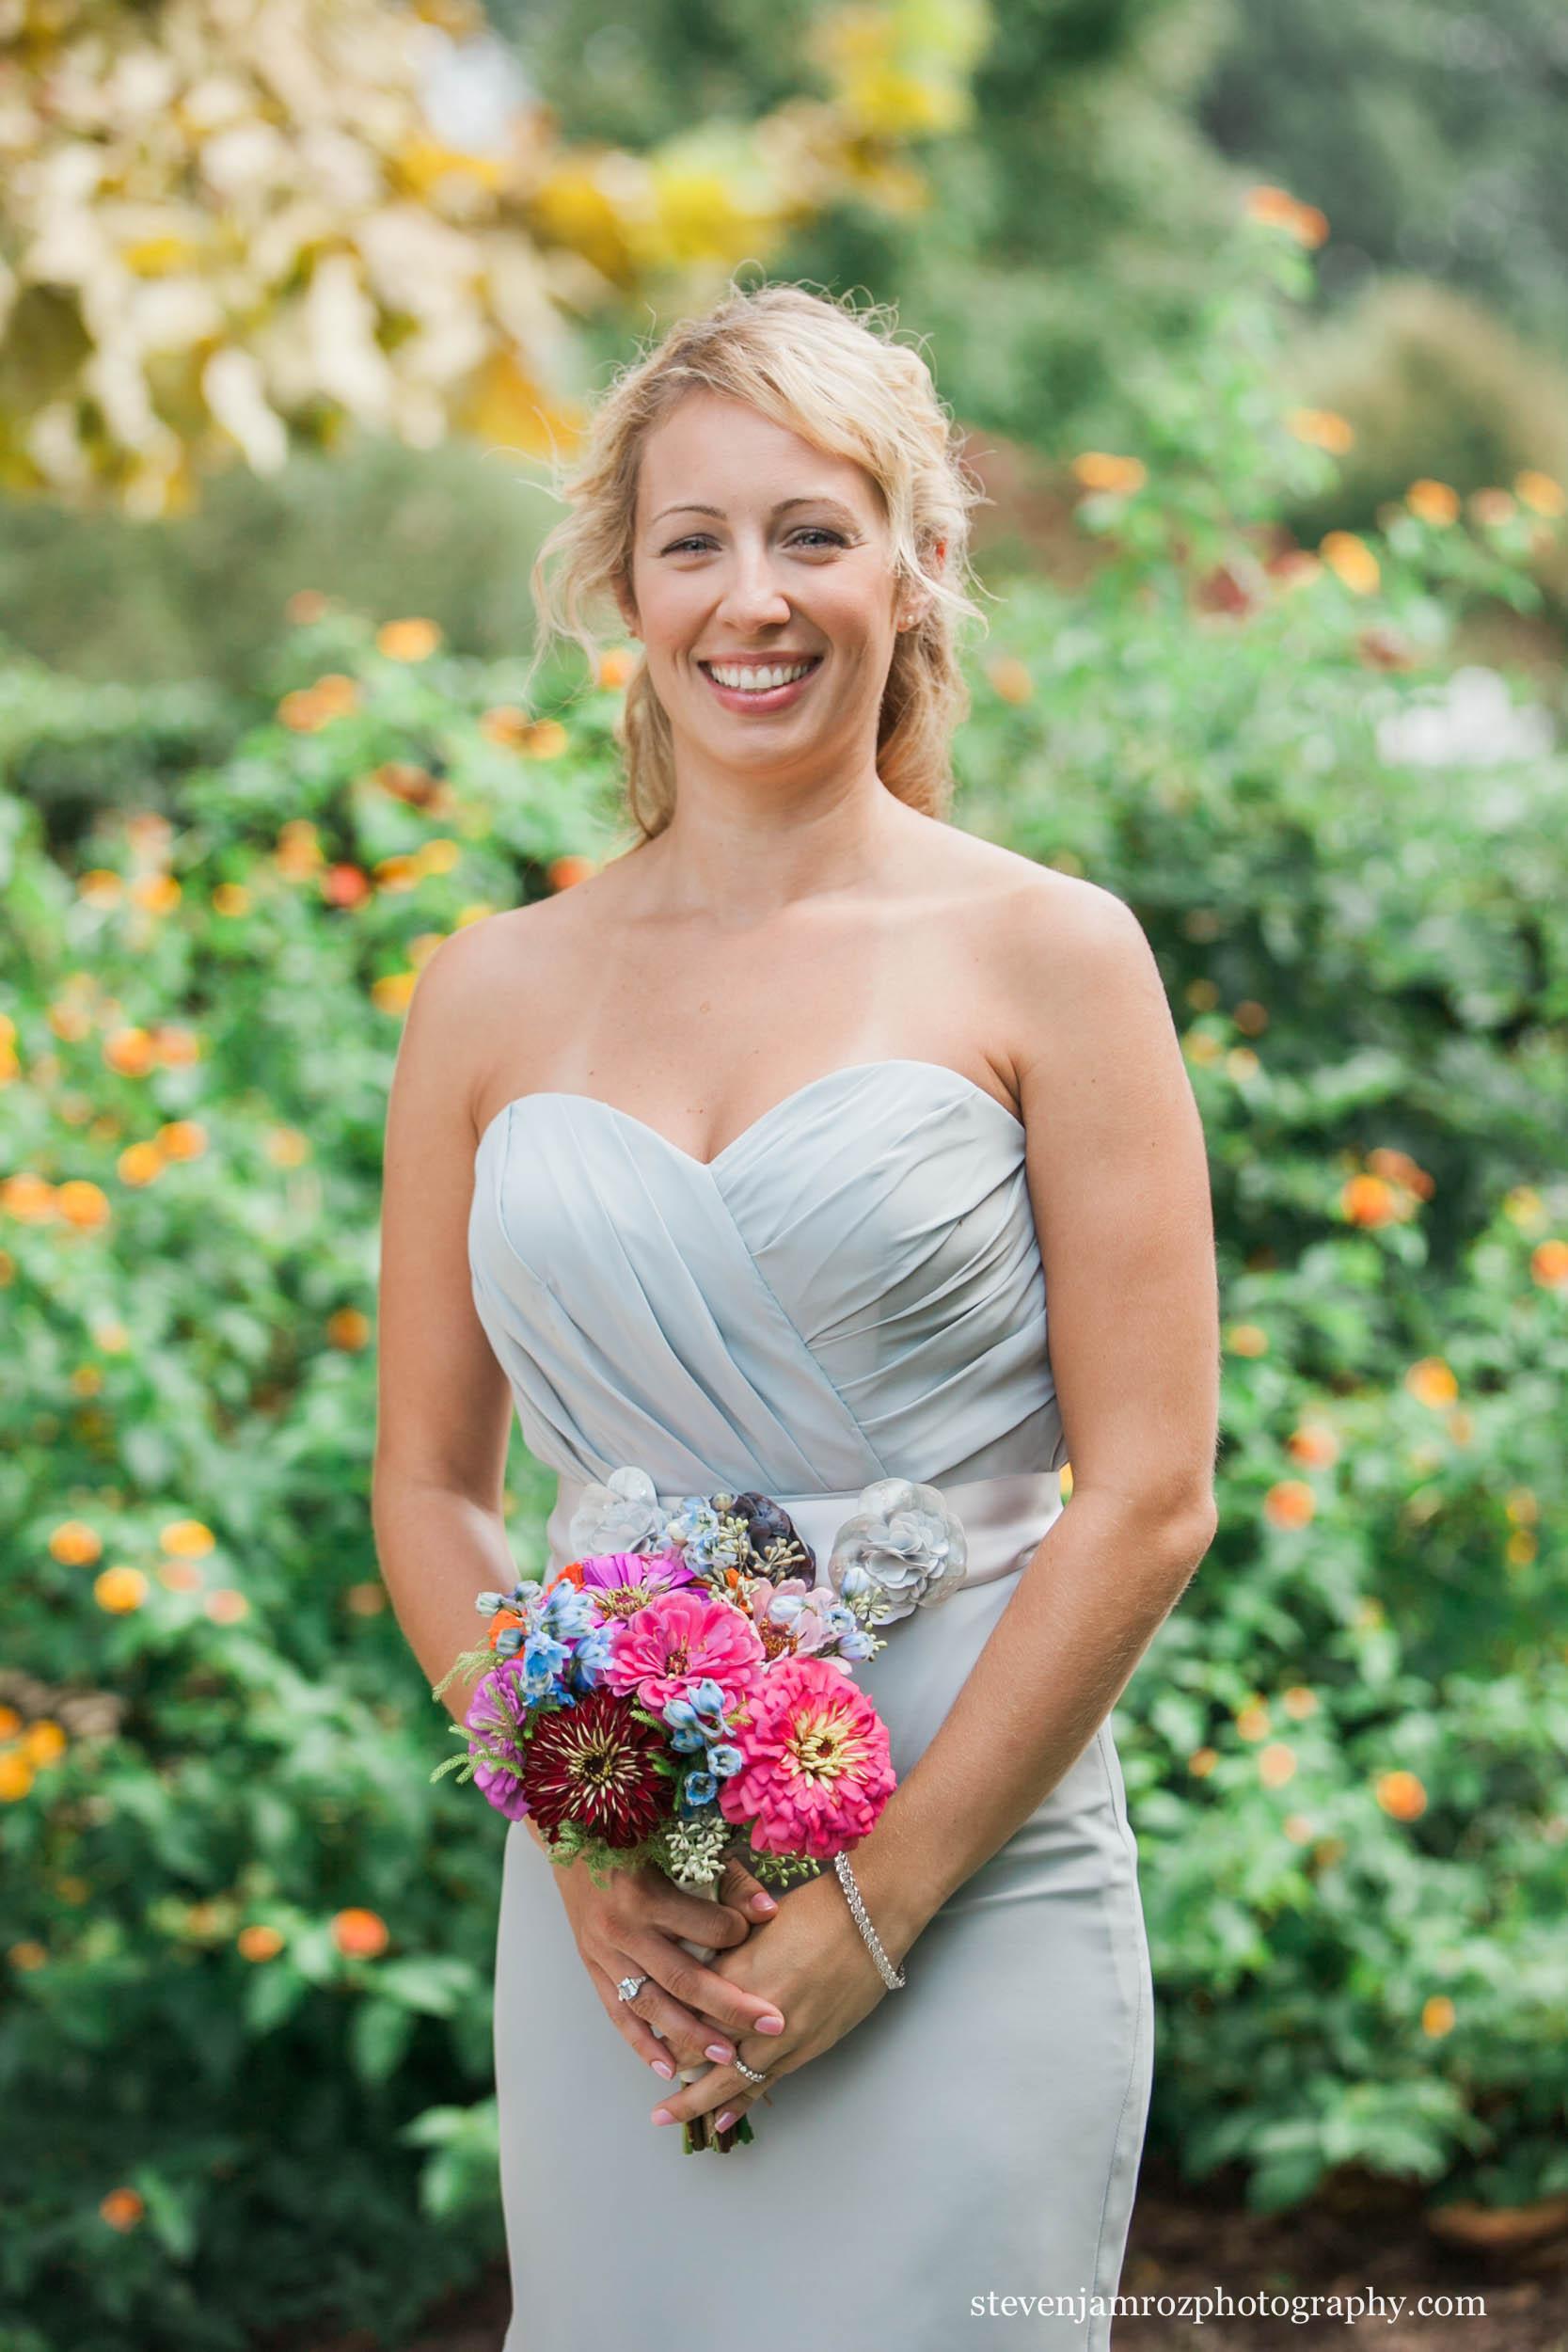 blue-pink-wedding-flower-bouquet-steven-jamroz-0734.jpg